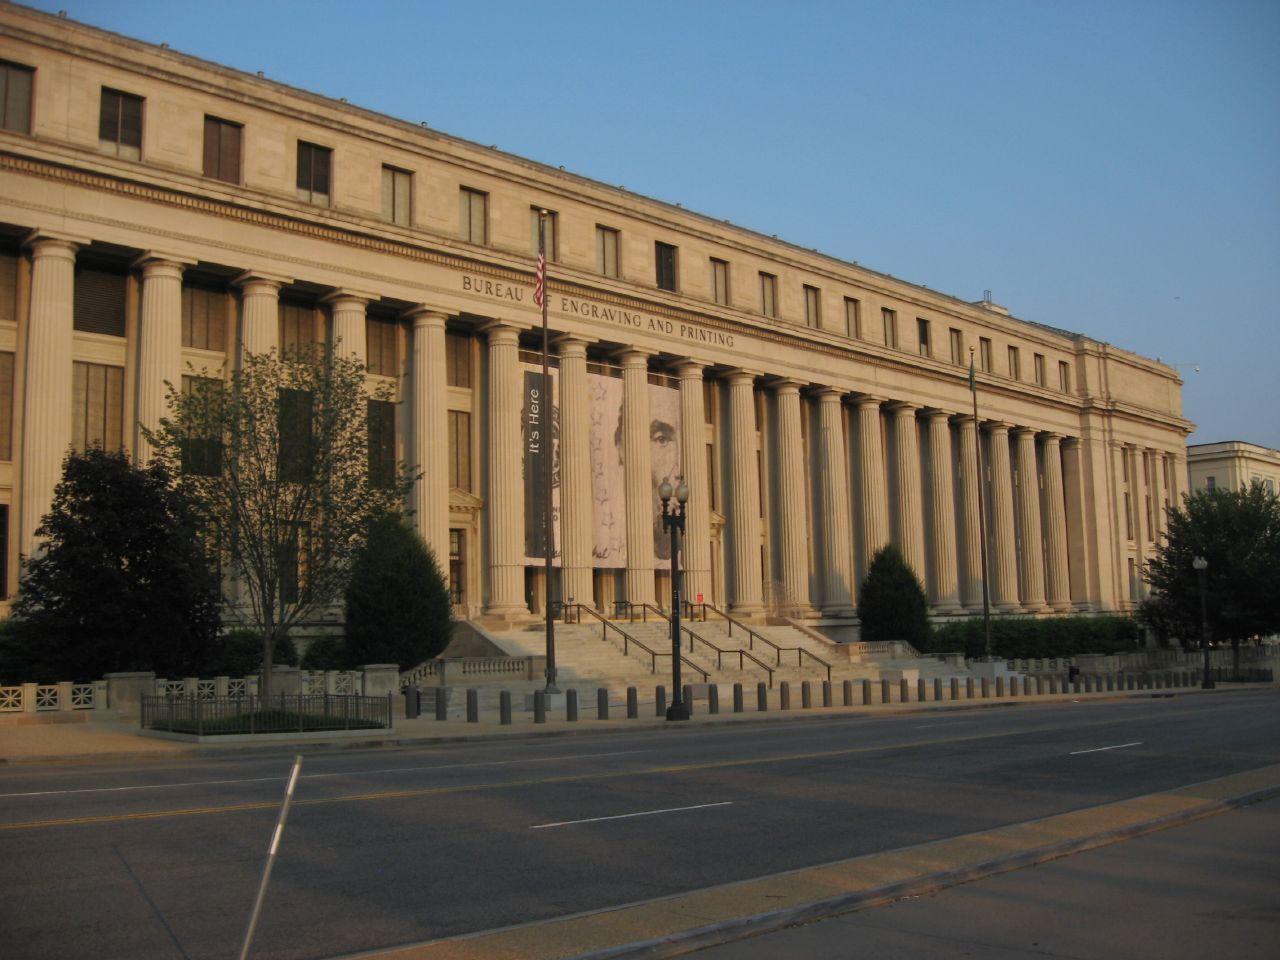 U.S. Bureau of Engraving and Printing